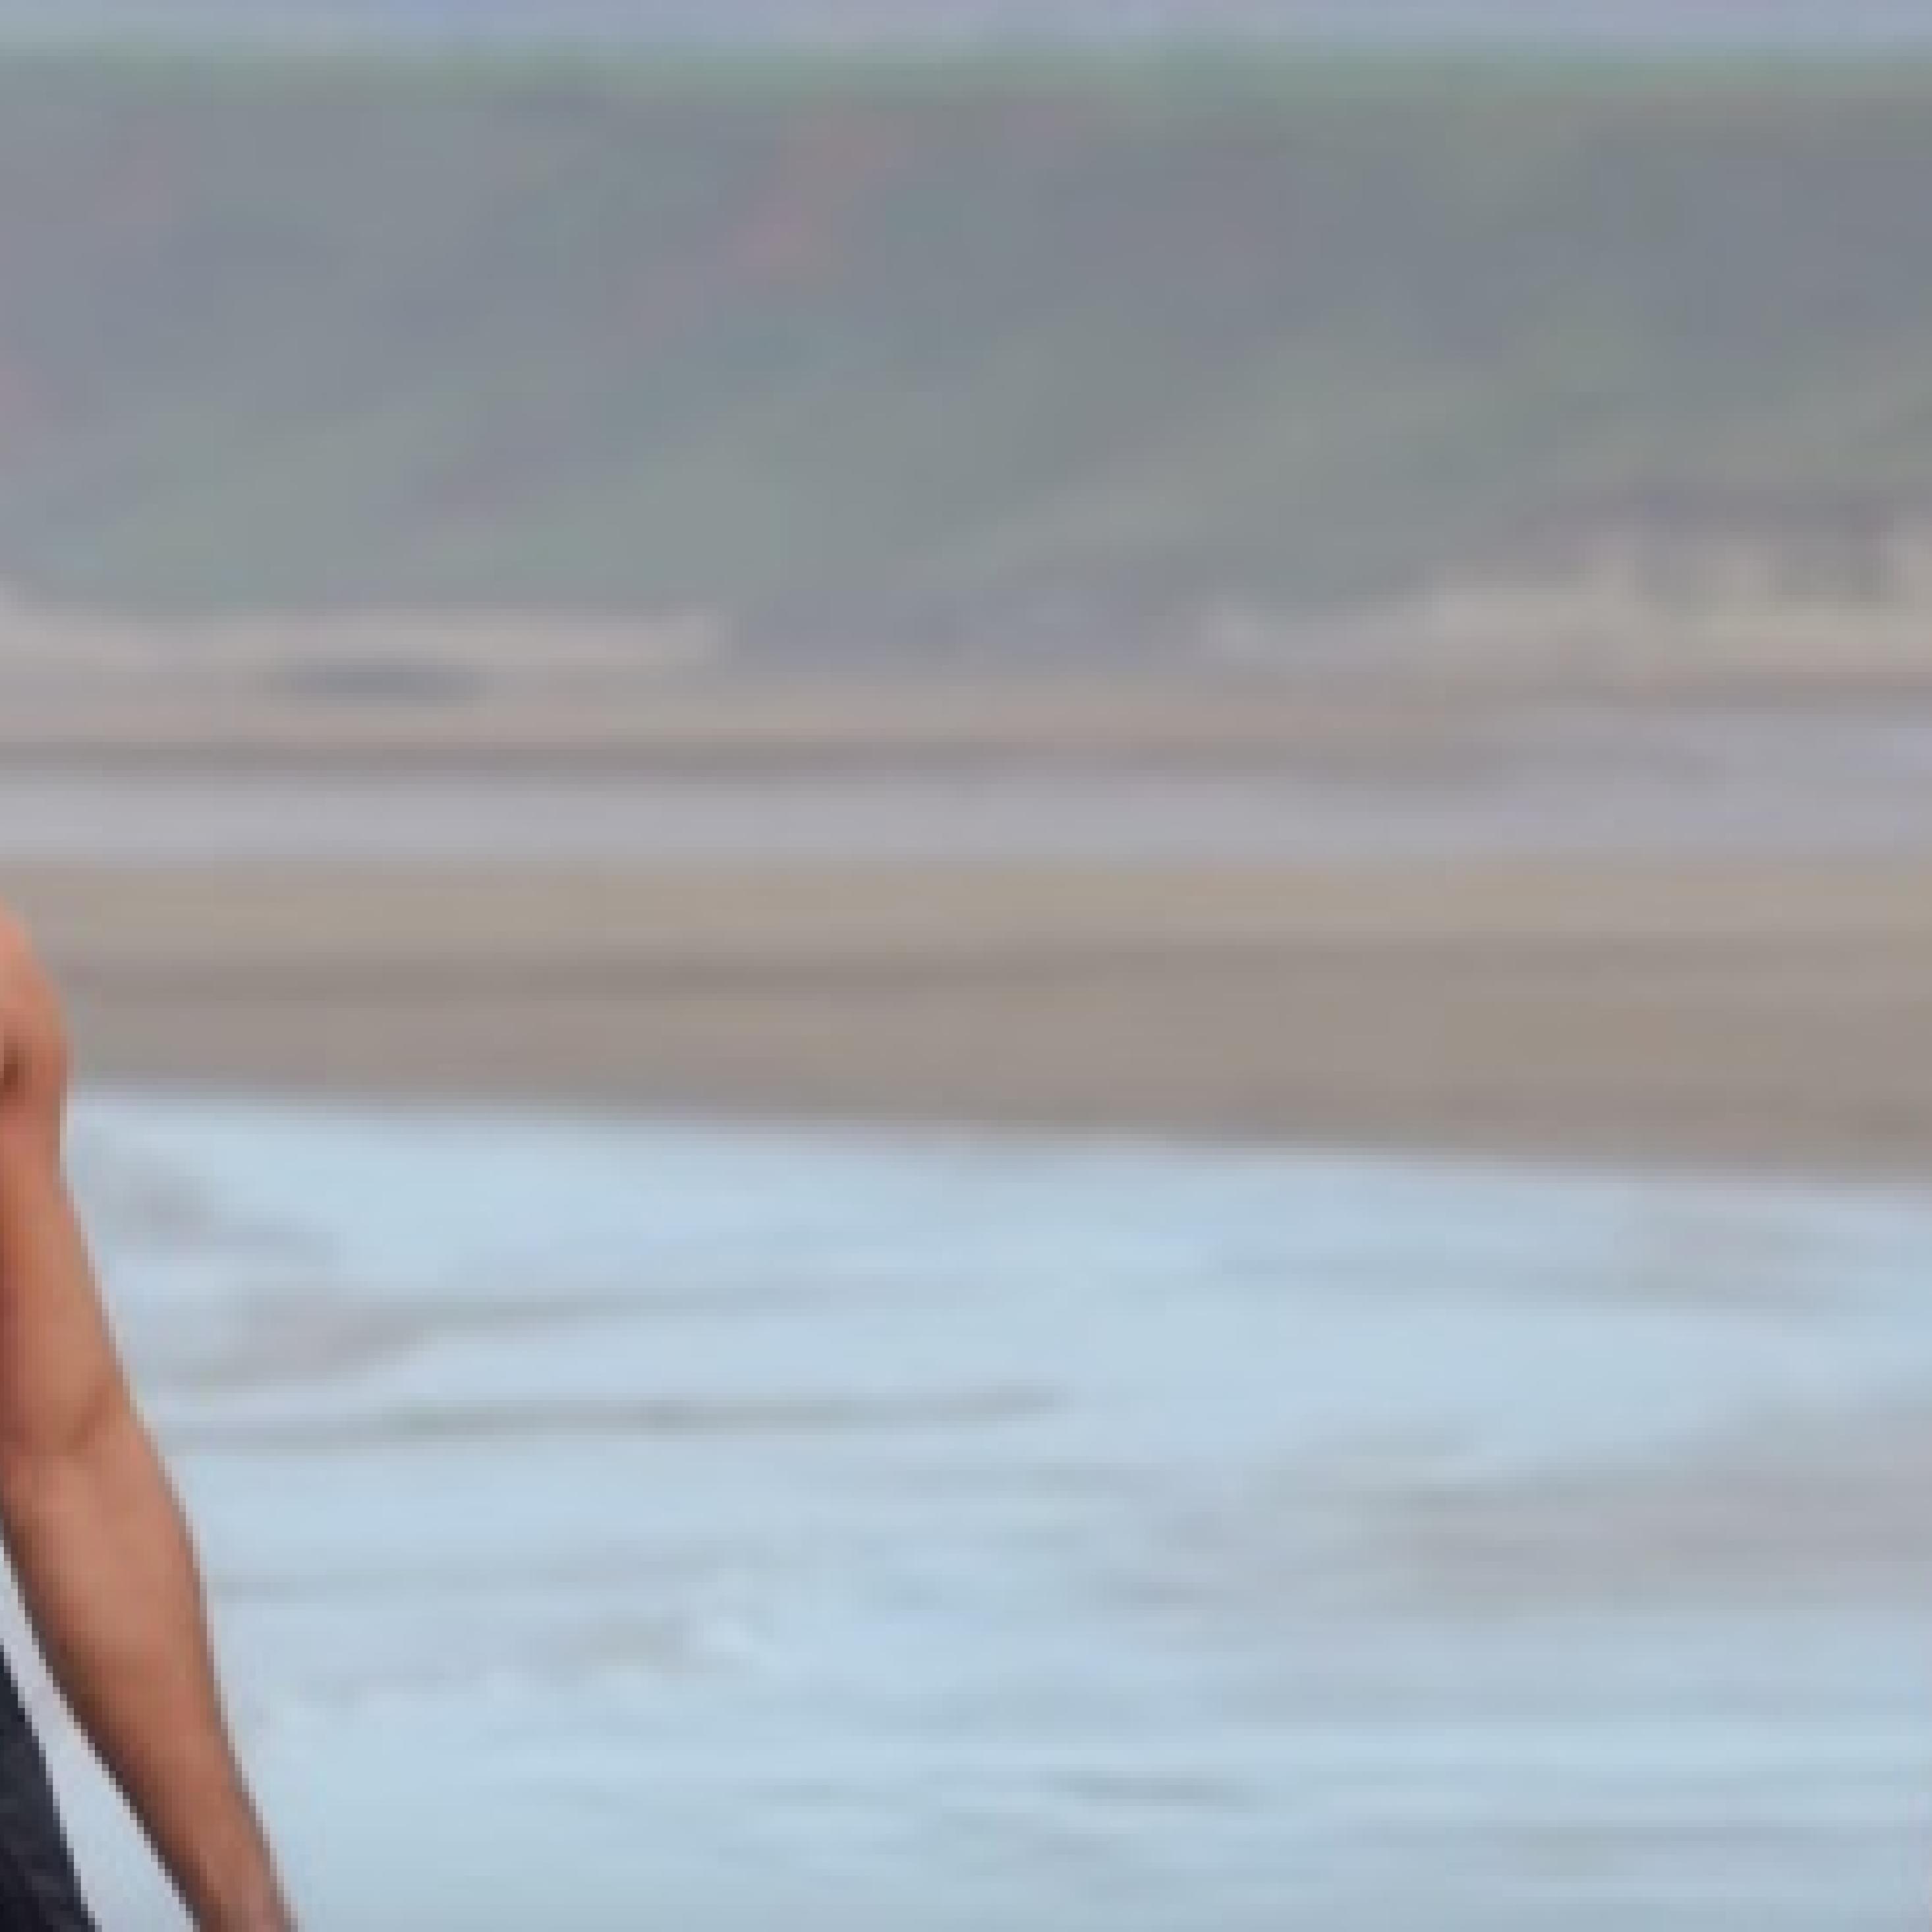 download shandaar movie alia bhatt bikini photoshoot 2932x2932